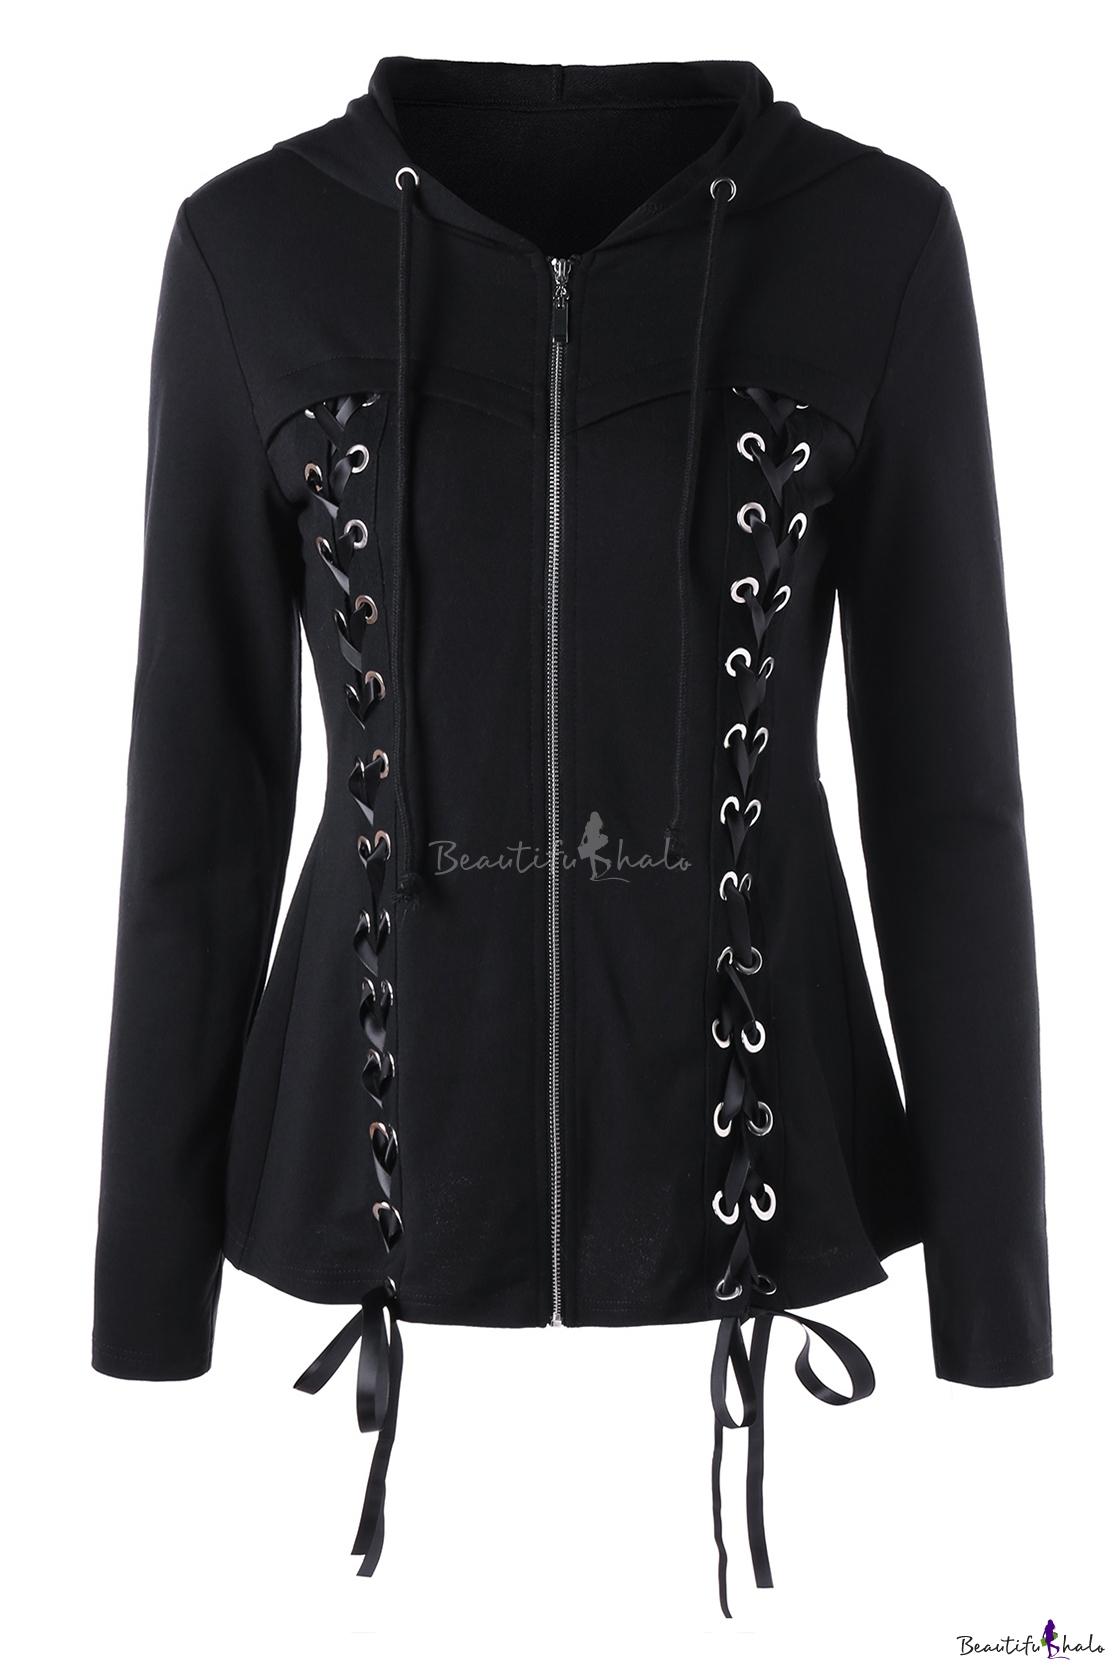 Lace Up Grommet Embellished Long Sleeve Plain Zip Up Hooded Coat